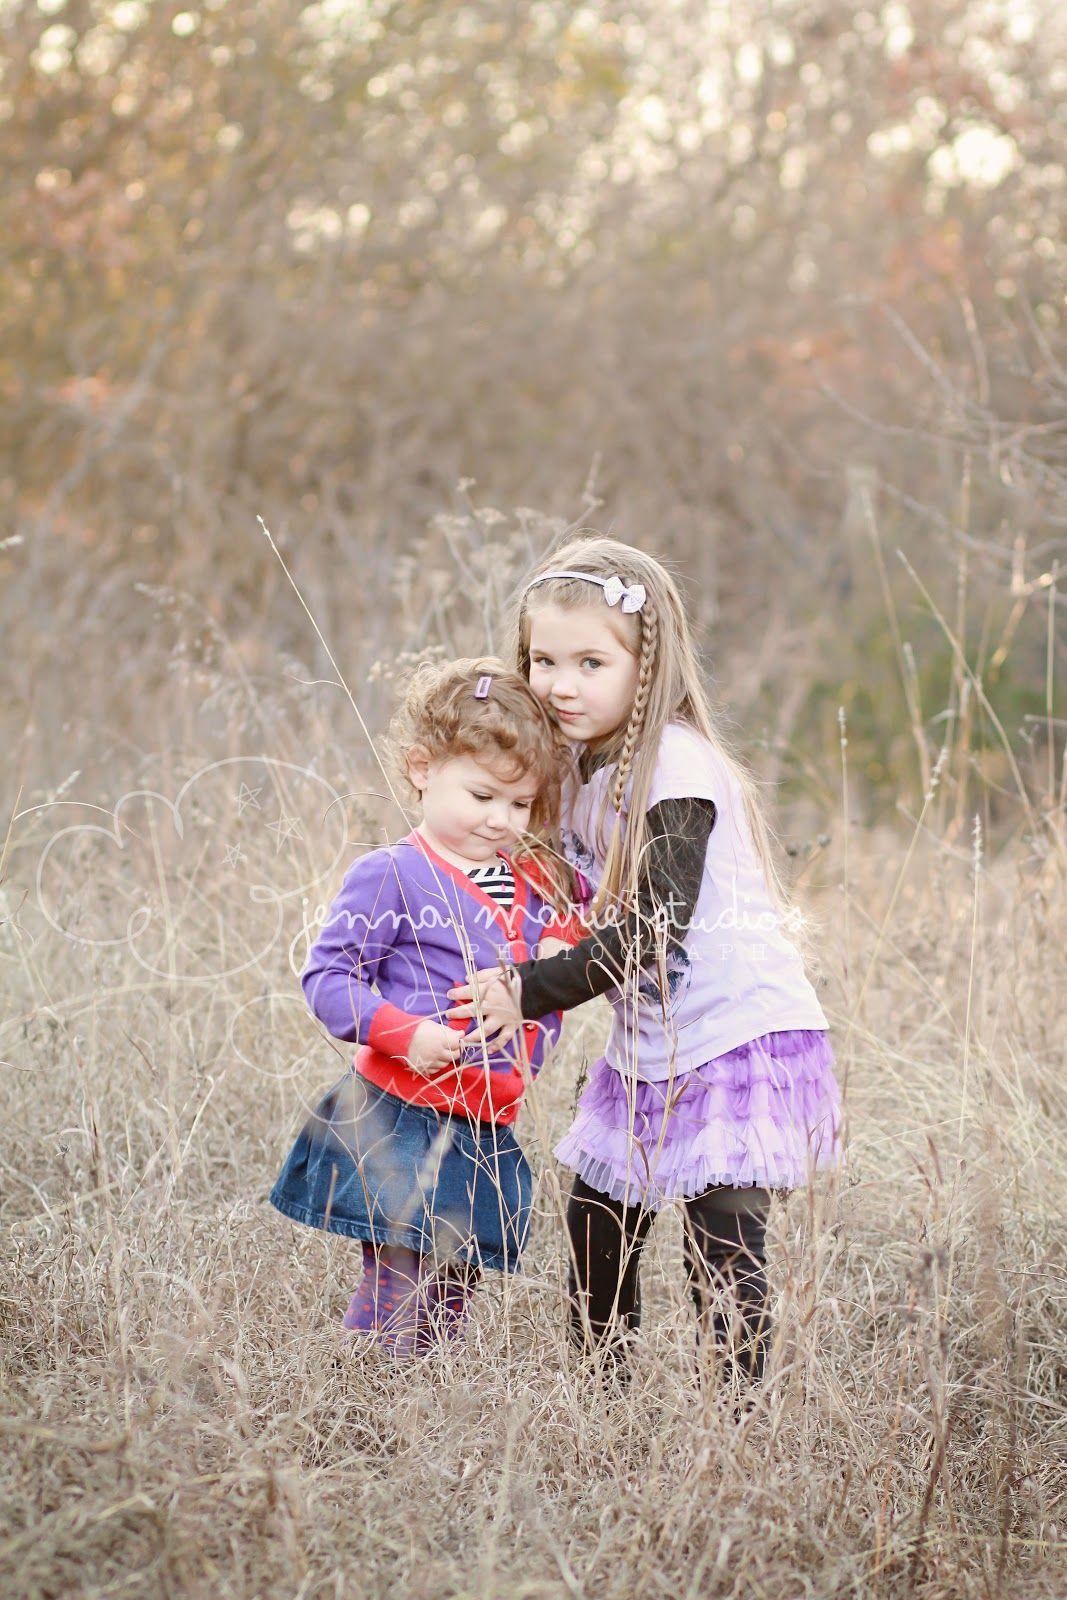 Jenna marie studios blog childphotography children photography studios tulle tutu